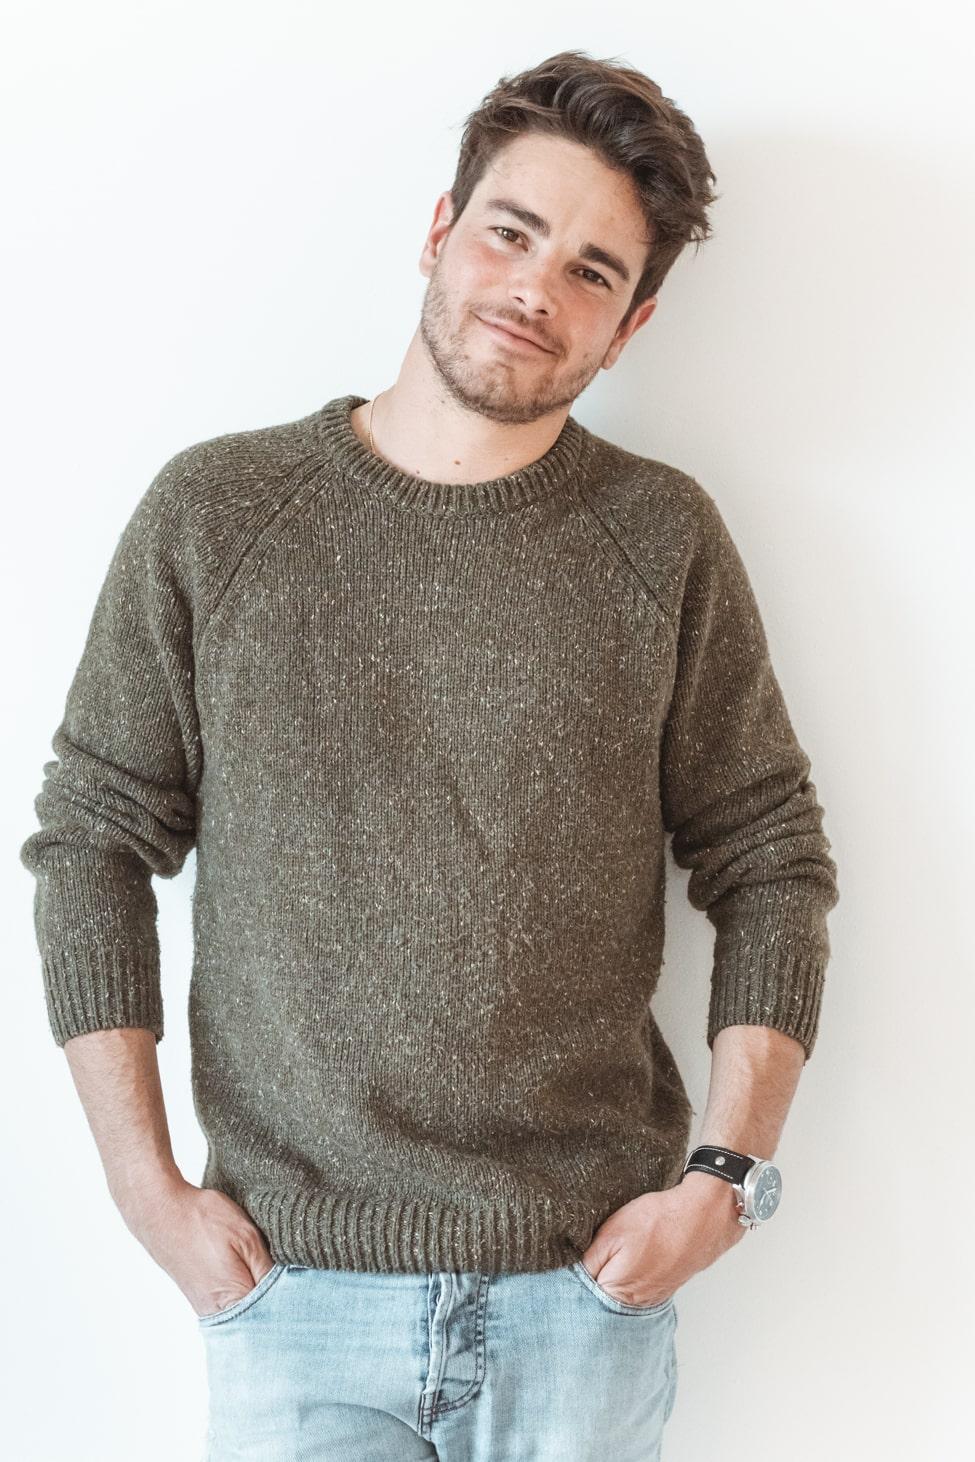 Lukas Schorn profile image